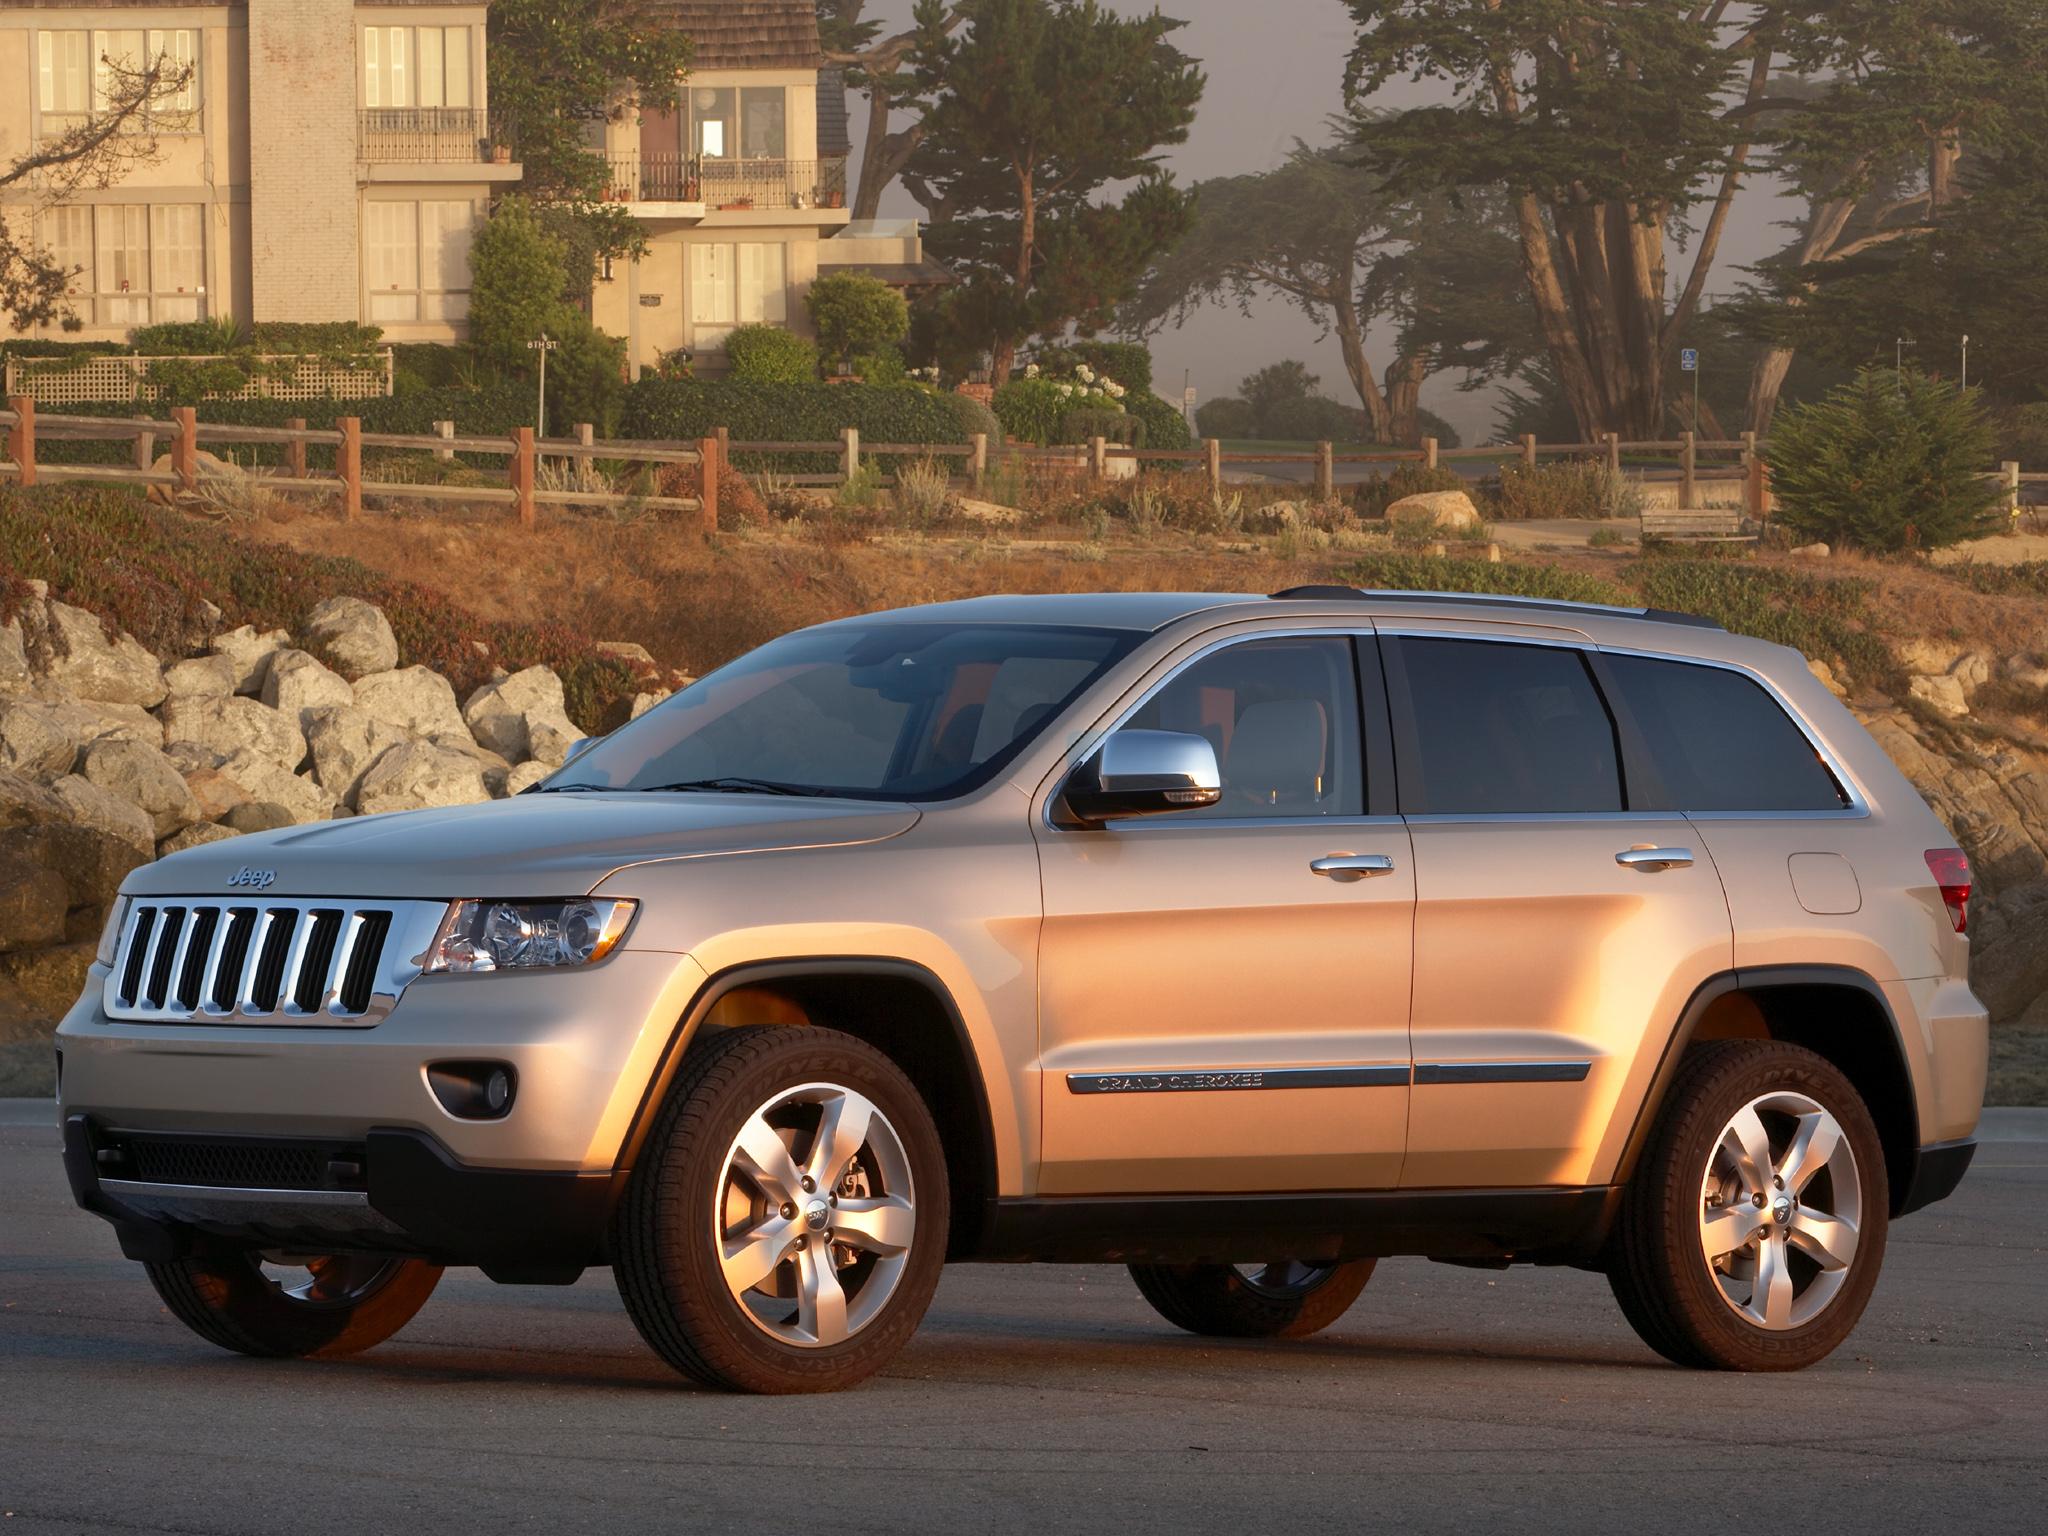 Grand Cherokee WK -consigli- Jeep_grand_cherokee_wk2_suv5d-2792